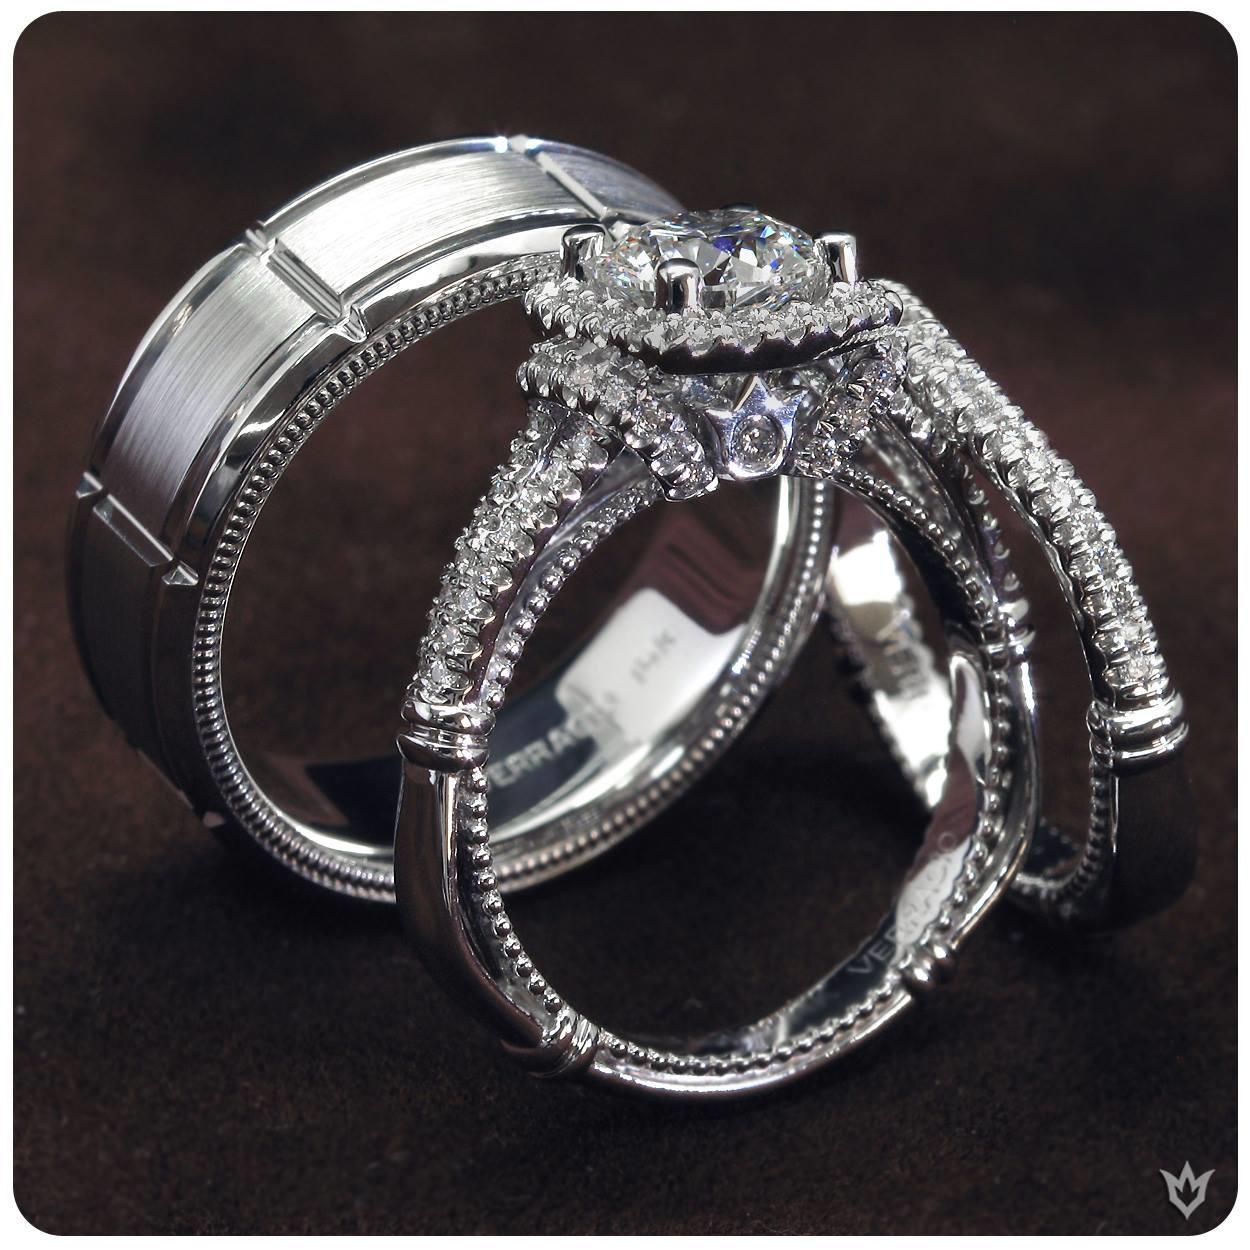 Emerald Lady Jewelry image 58